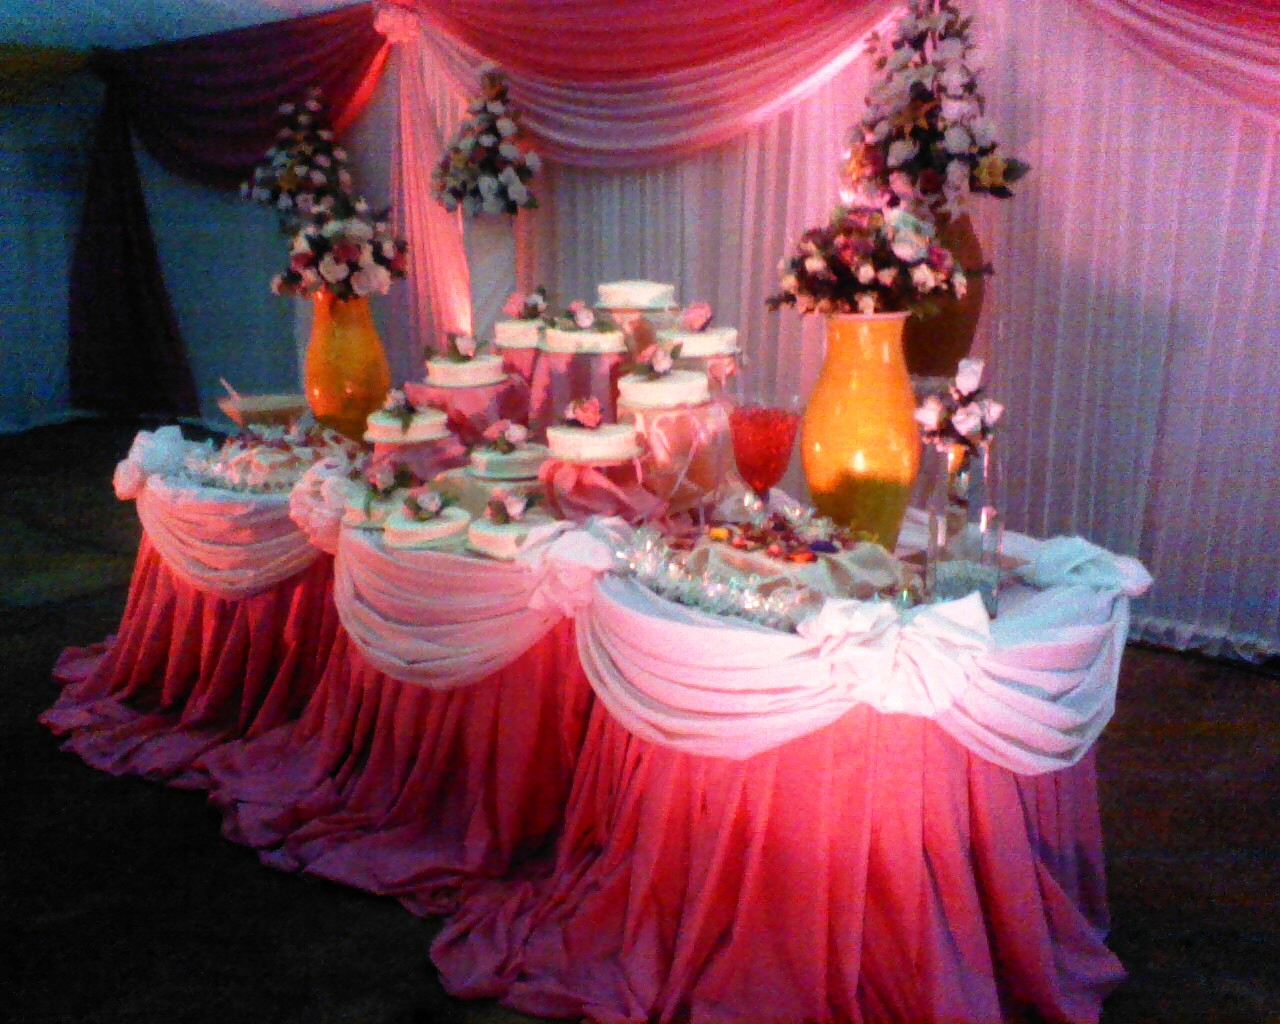 Decoracion de mesas para 15 anos for Decoracion de quinceanera